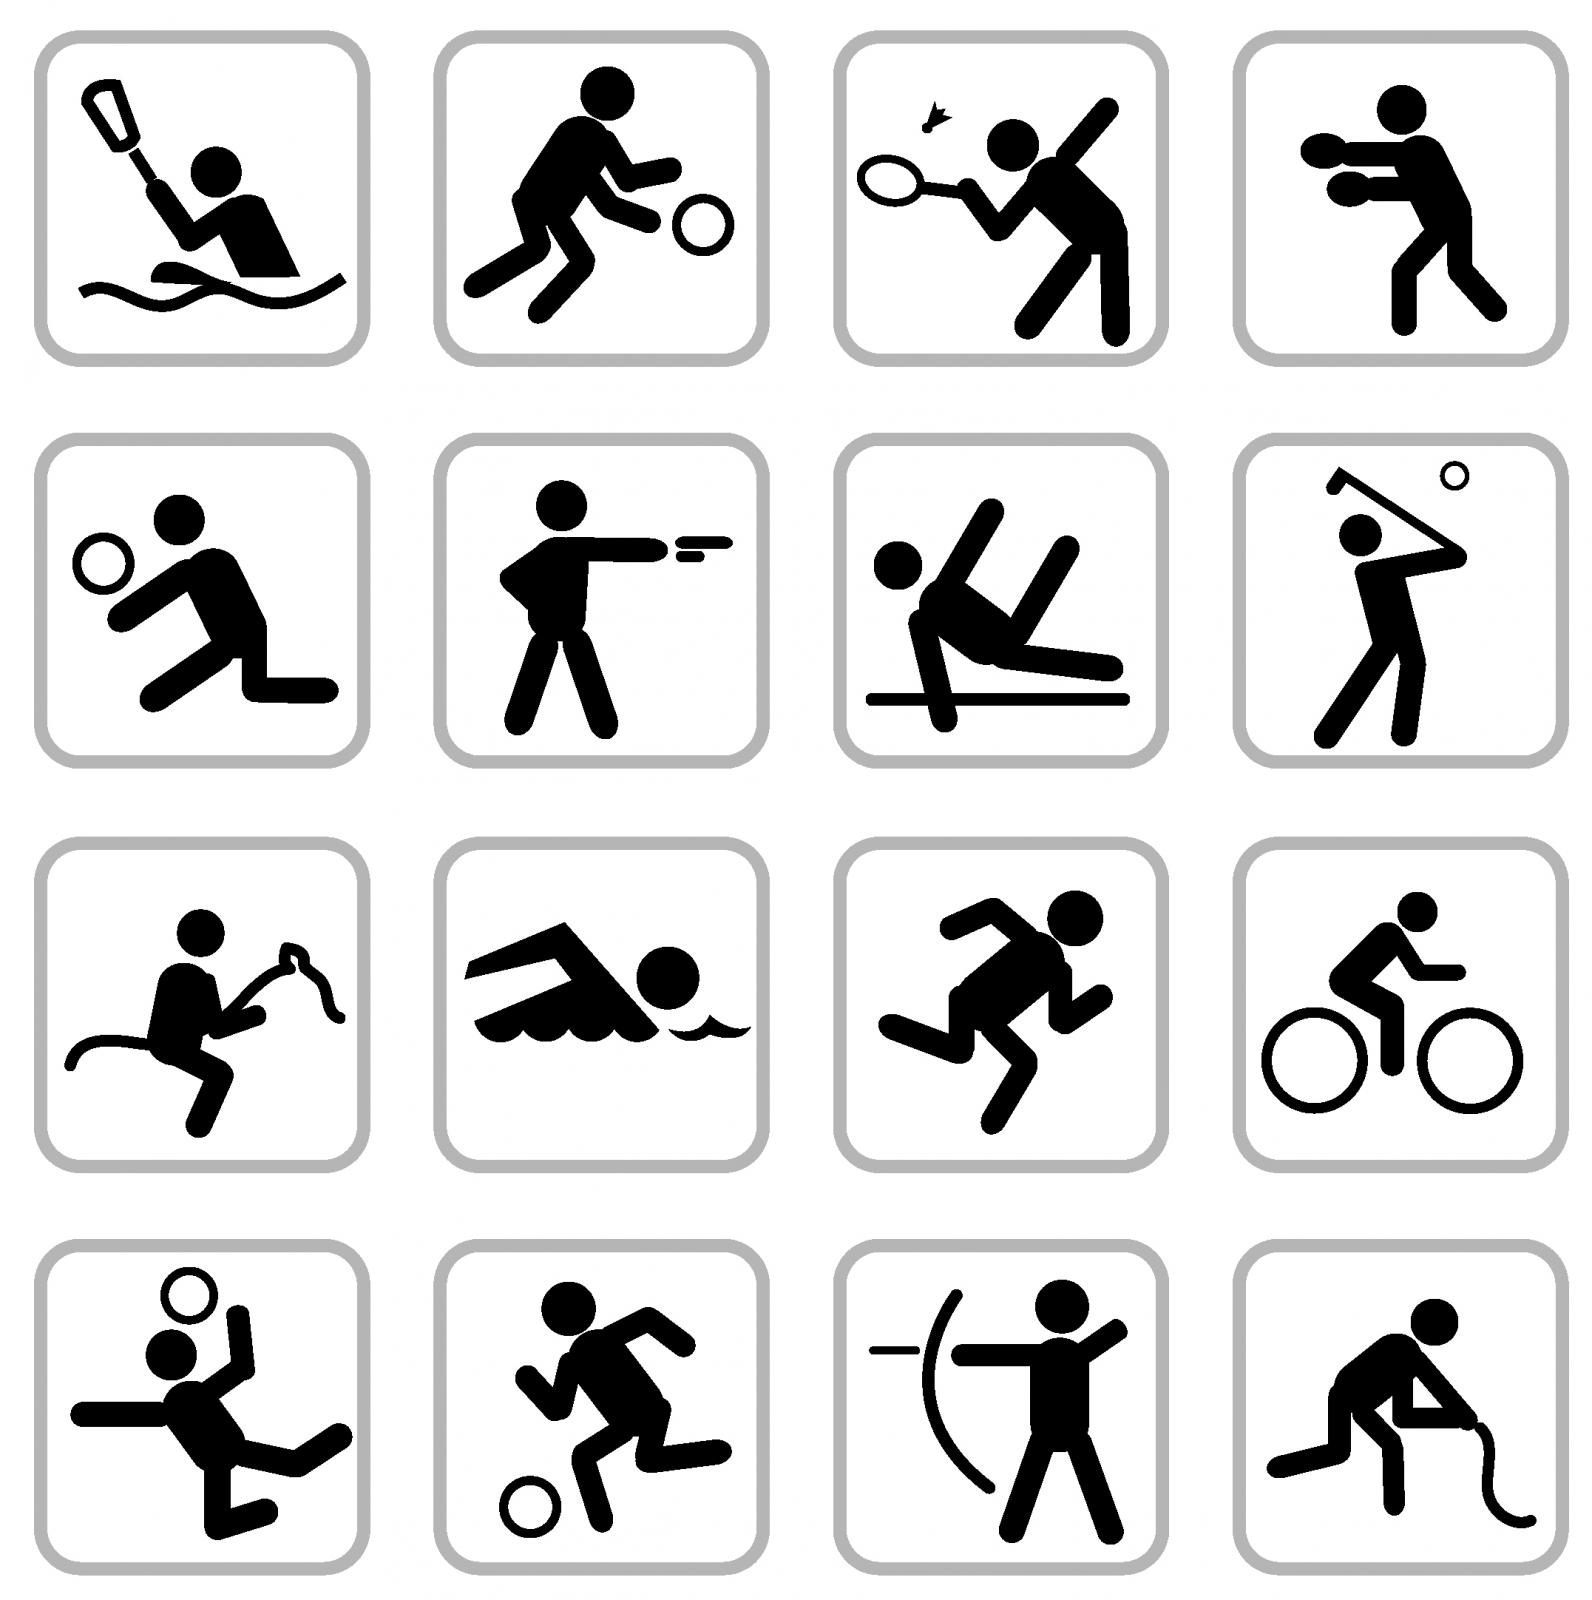 14 Sports Icon Symbols Images